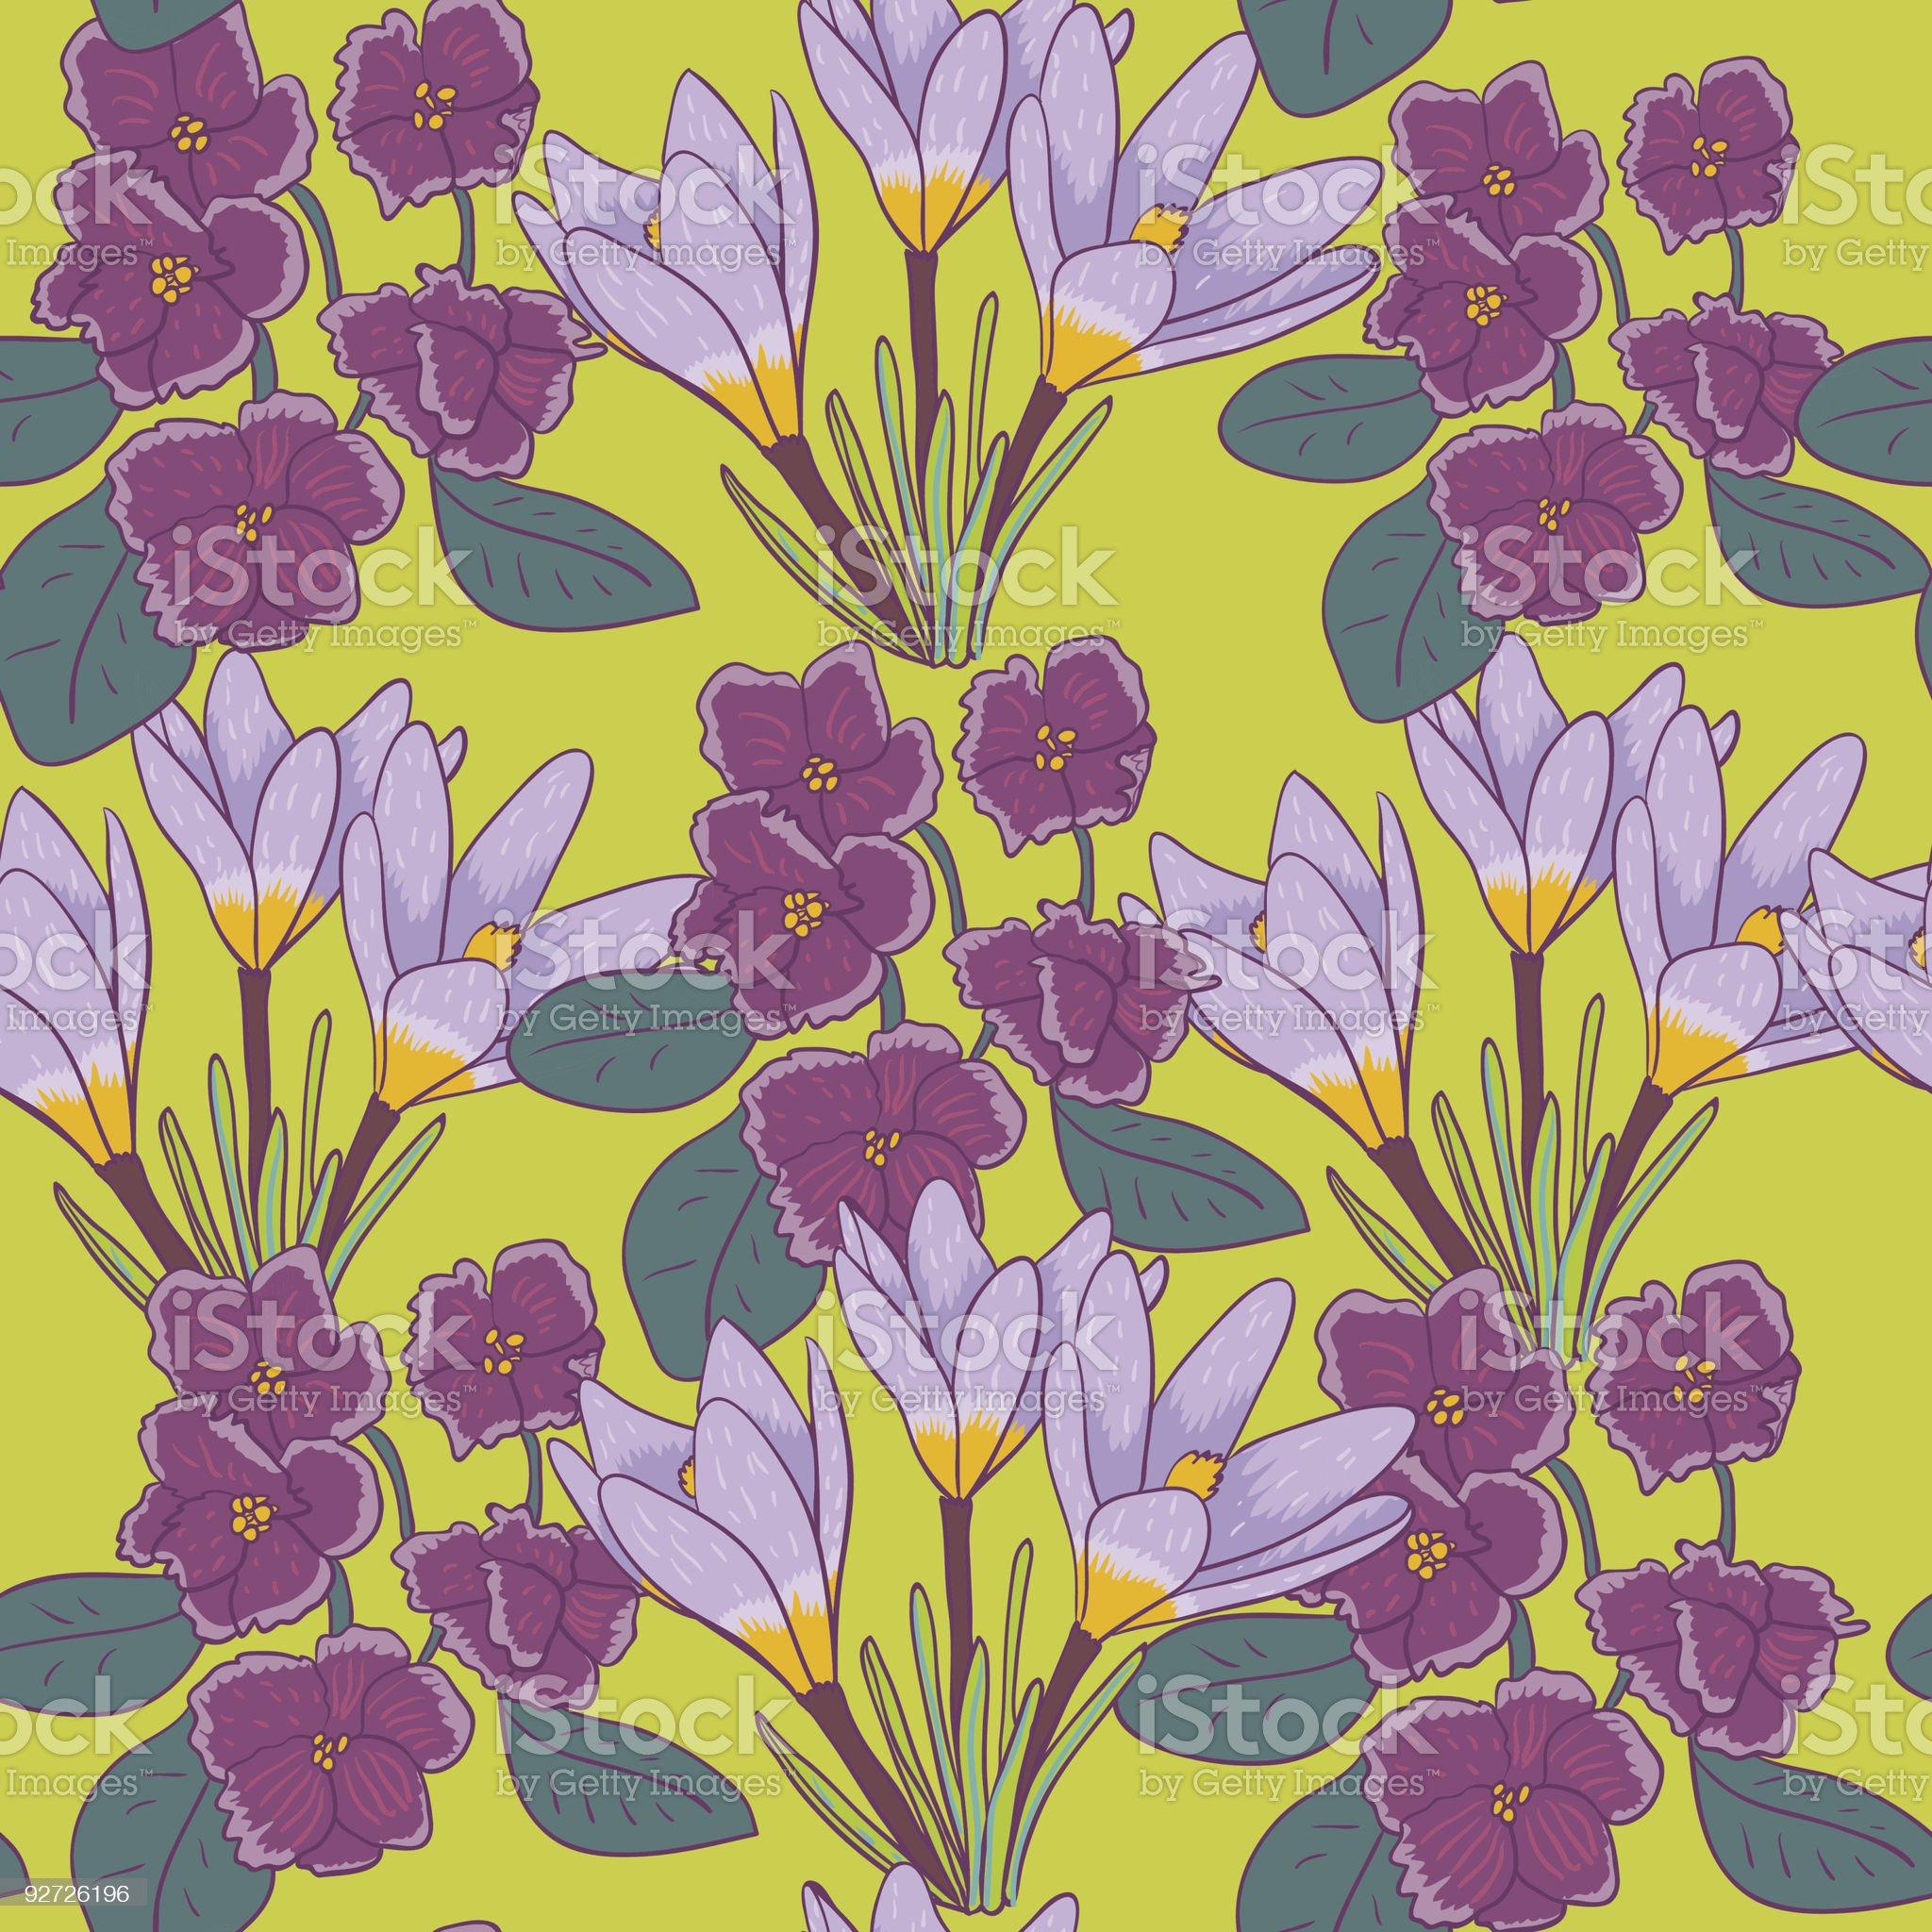 Violet flowers royalty-free stock vector art